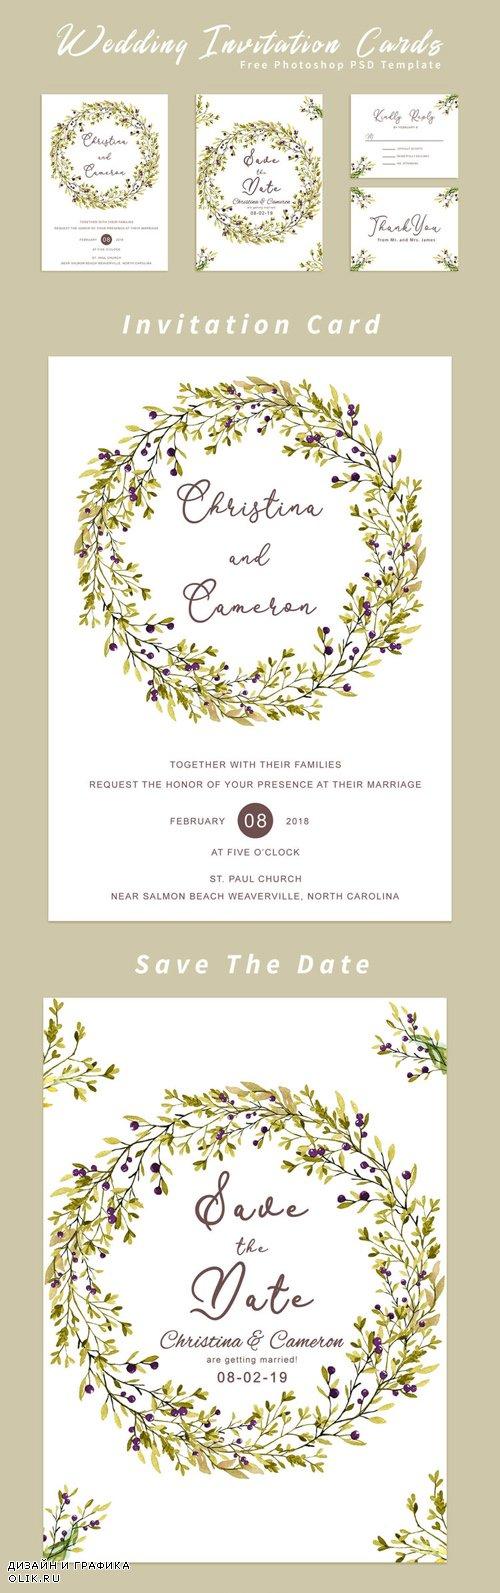 Wedding Invitation Cards - PSD Template